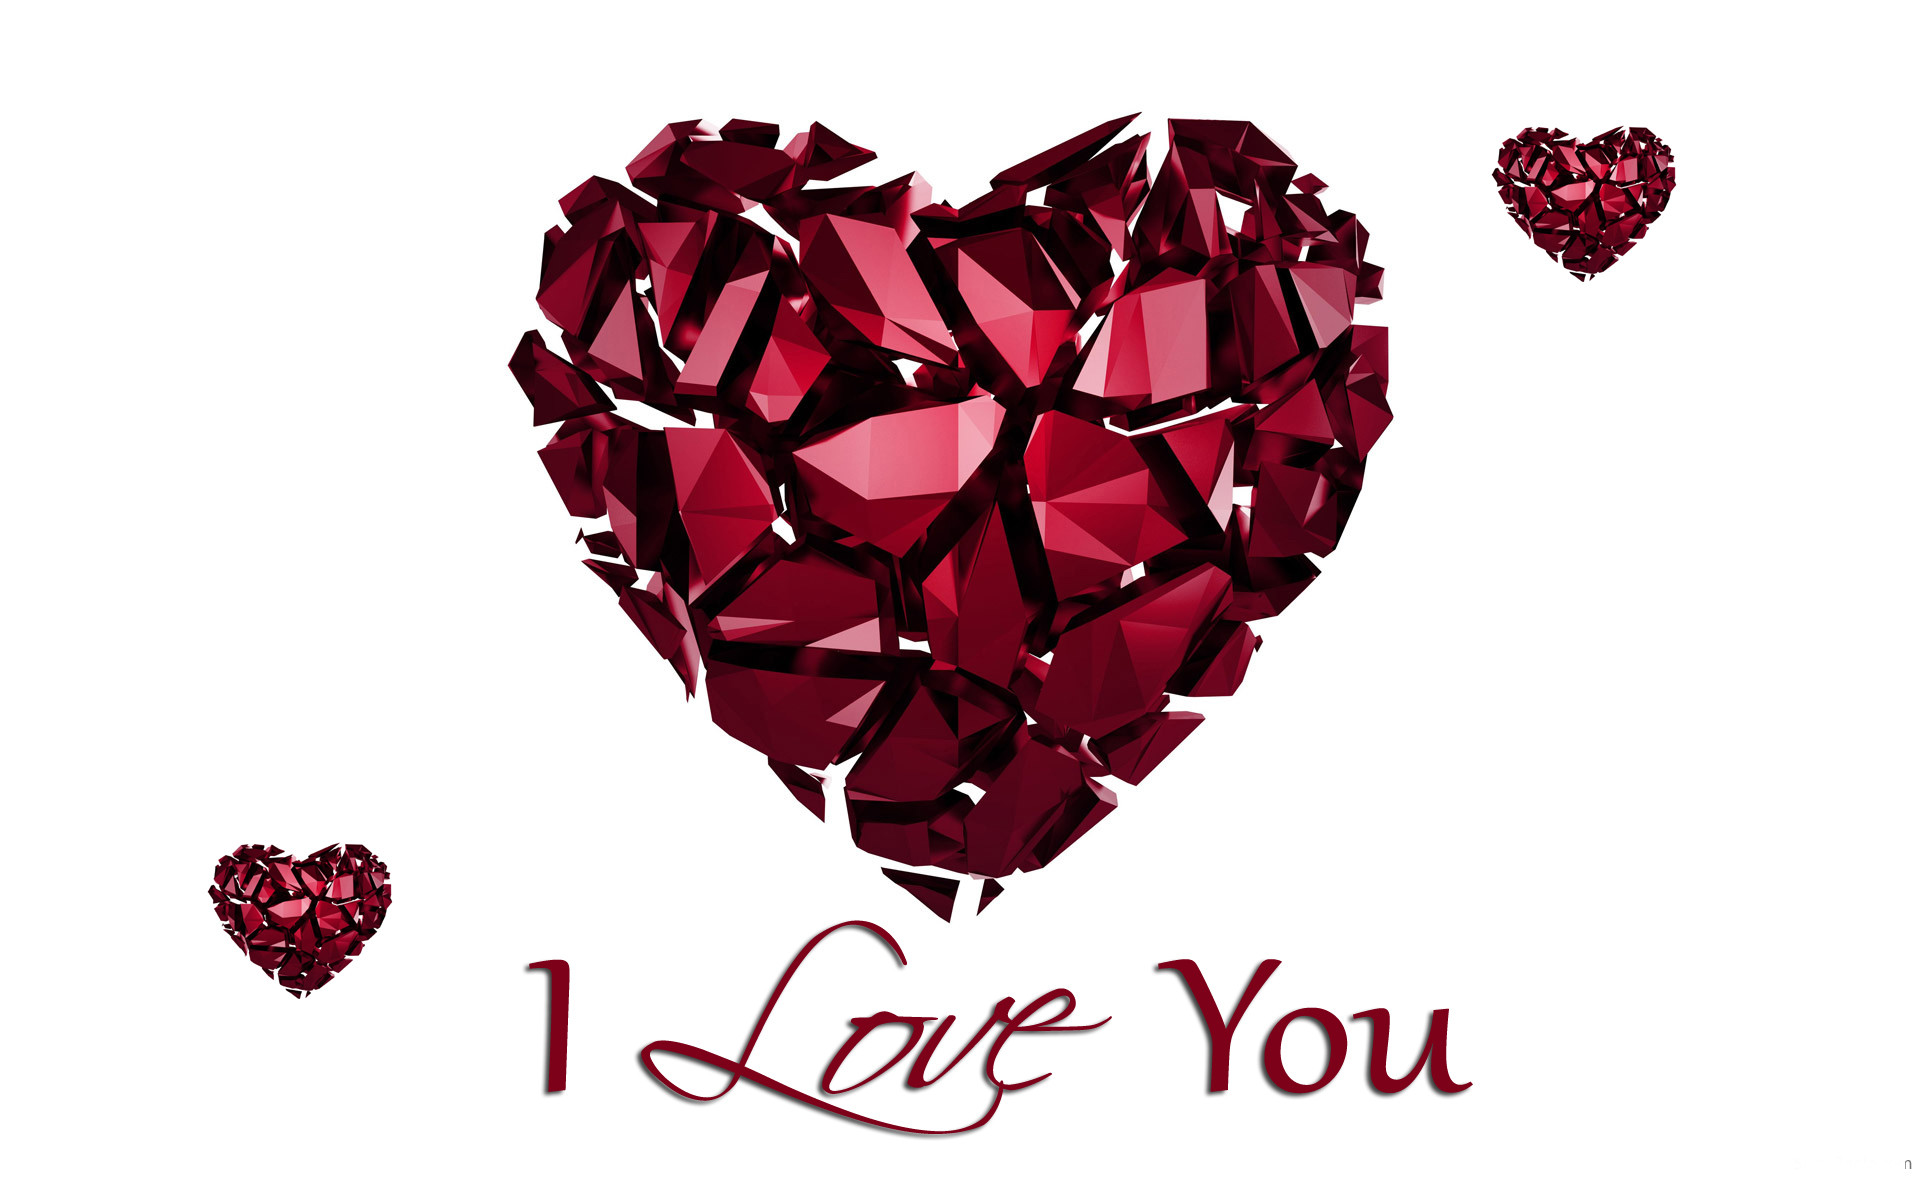 Res: 1920x1200, Broken Heart clipart i love you heart #4